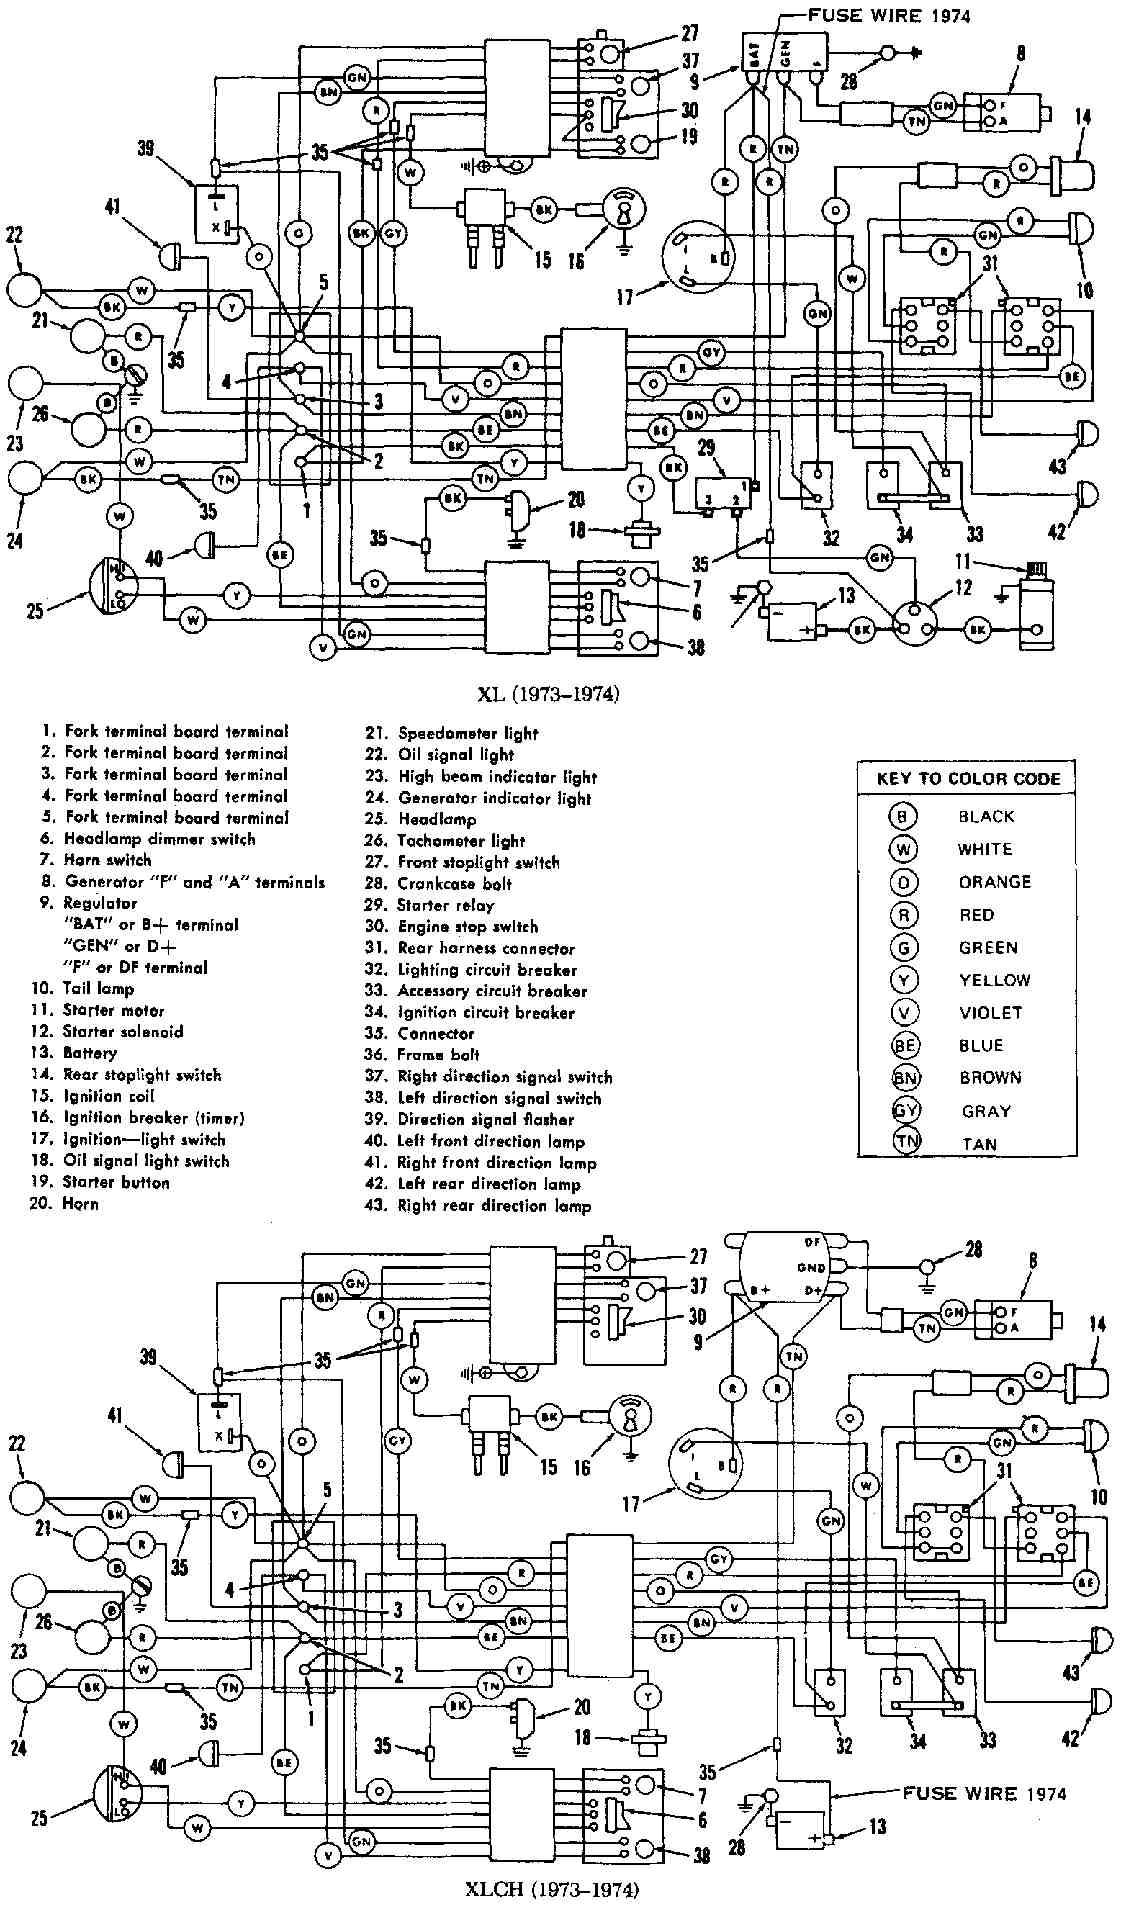 harley softtail wiring diagram for dummies car wiring diagram Harley Radio Wiring Diagram harley softail wiring diagram facbooik com harley softtail wiring diagram for dummies harley davidson wiring diagram manual harley davidson flh flt fxr harley radio wiring diagram